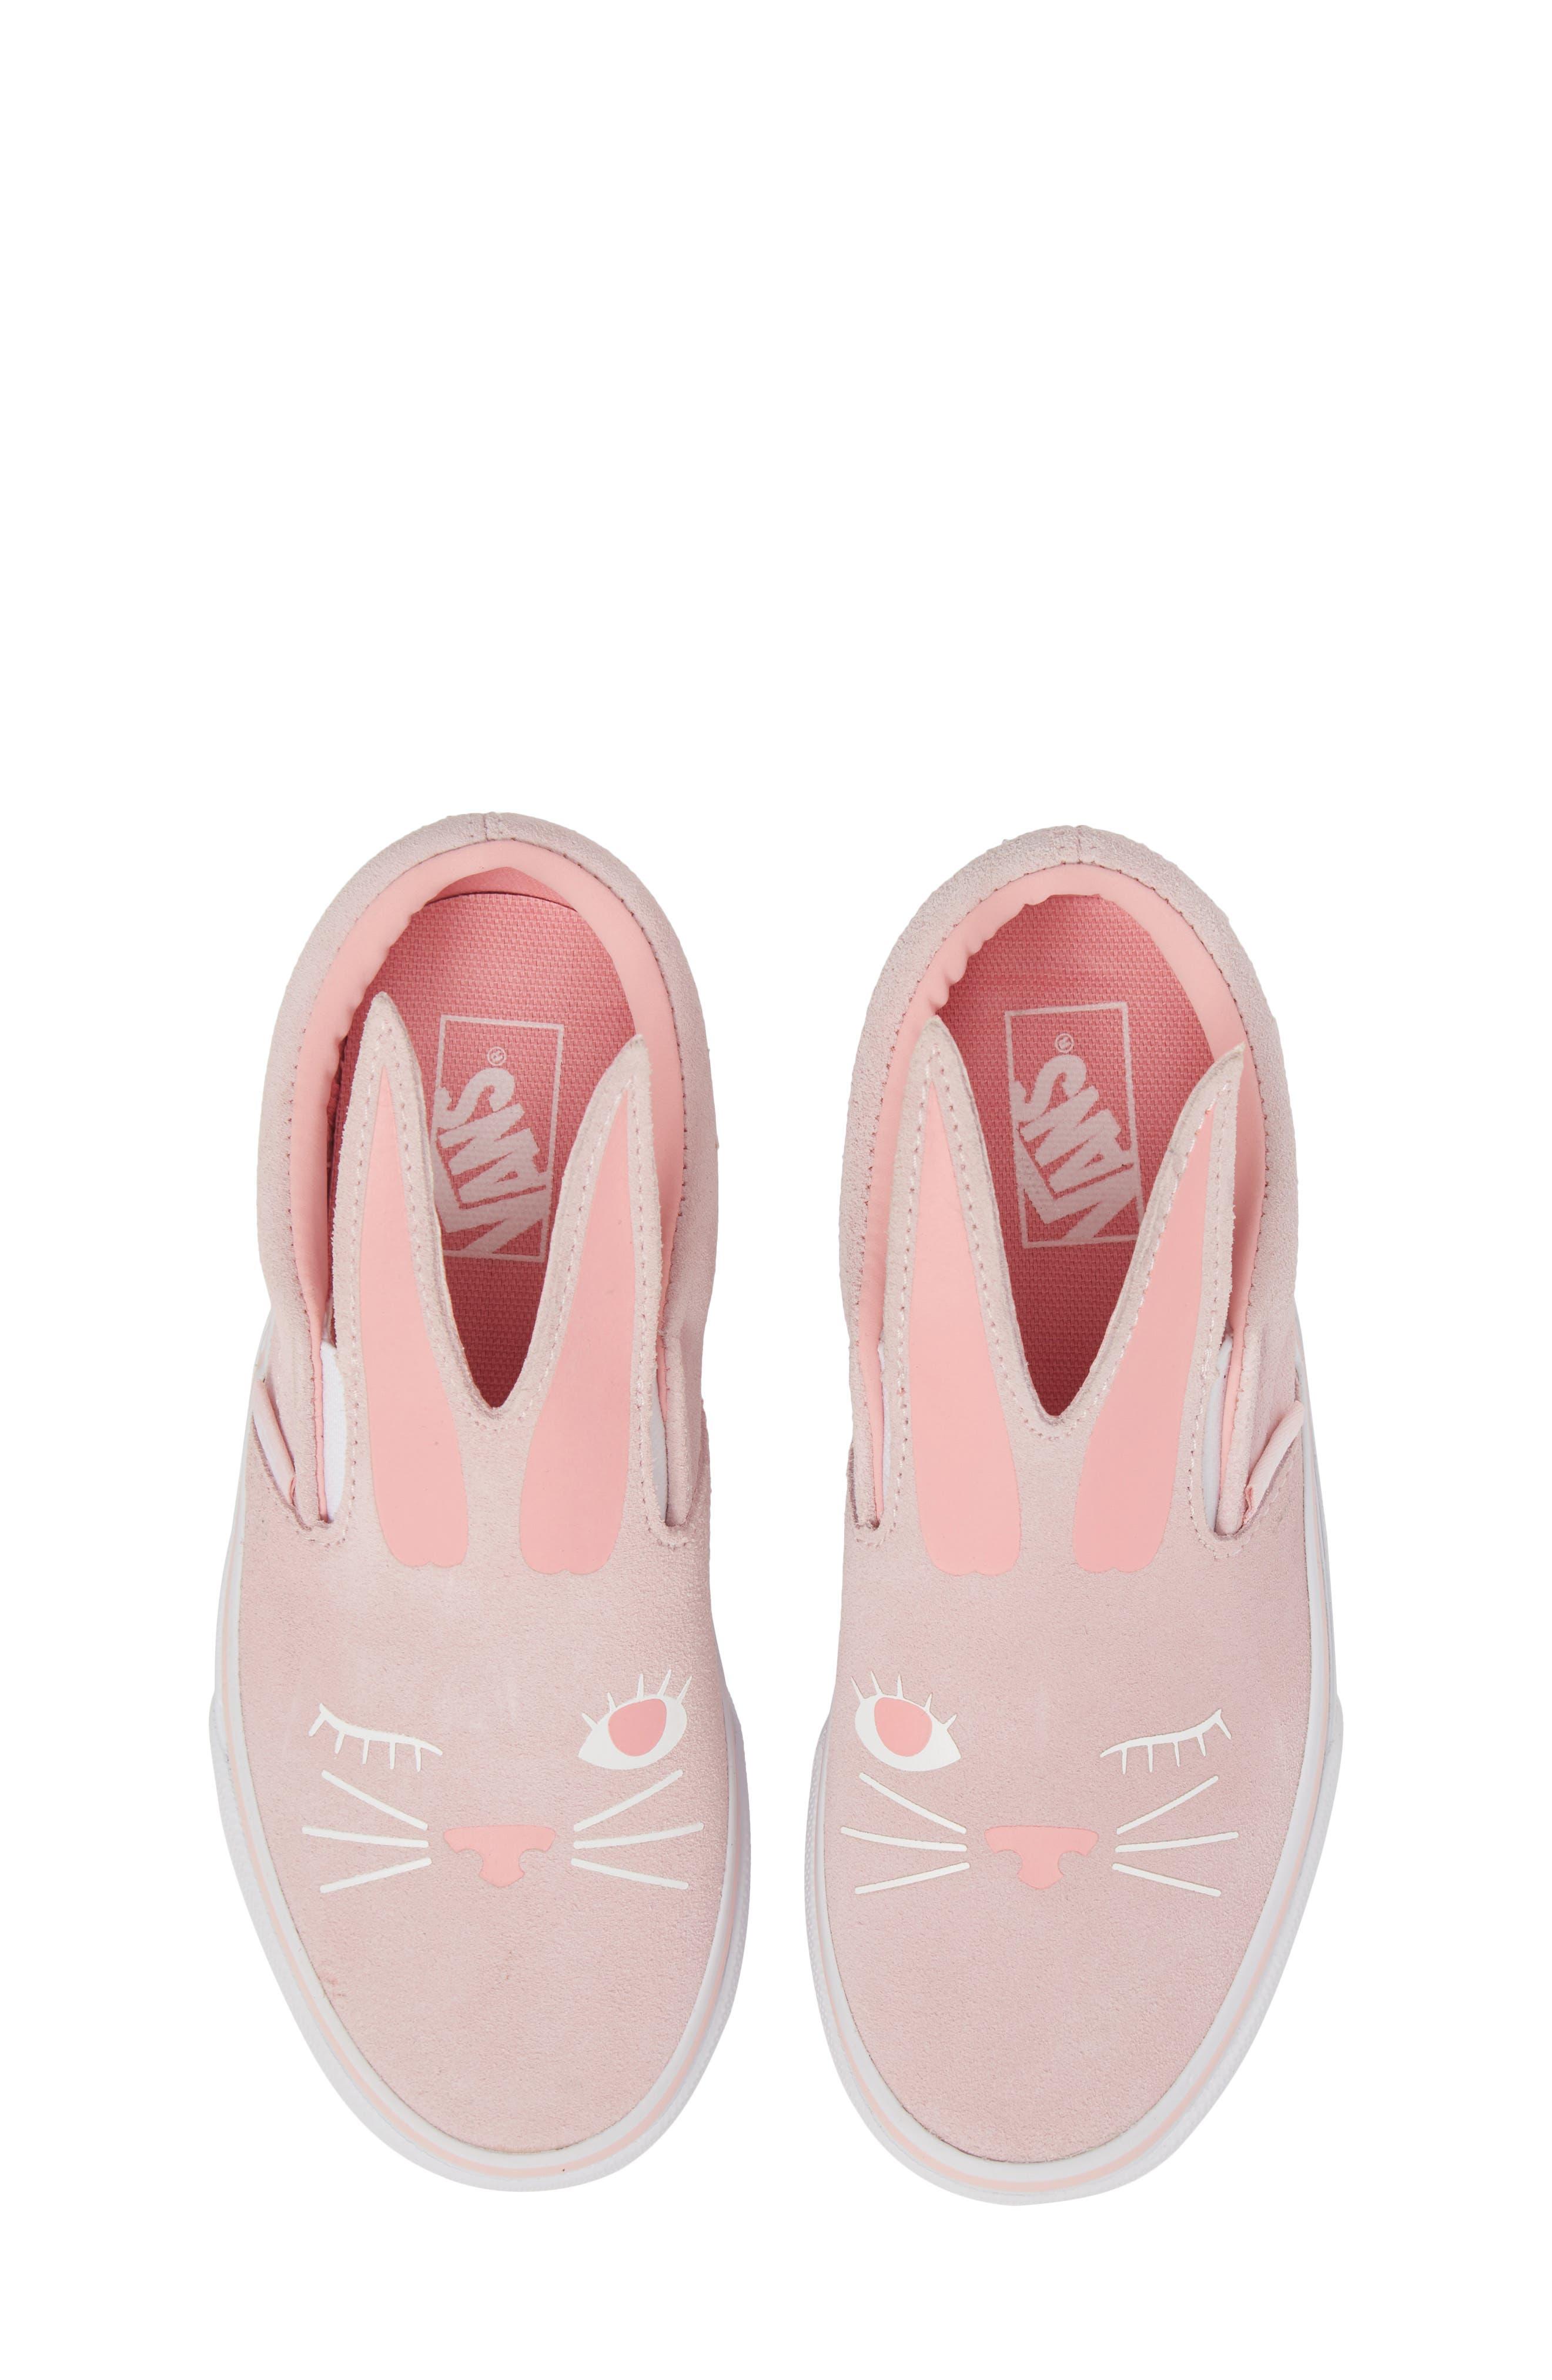 Slip-On Bunny Sneaker,                         Main,                         color, Chalk Pink/ True White